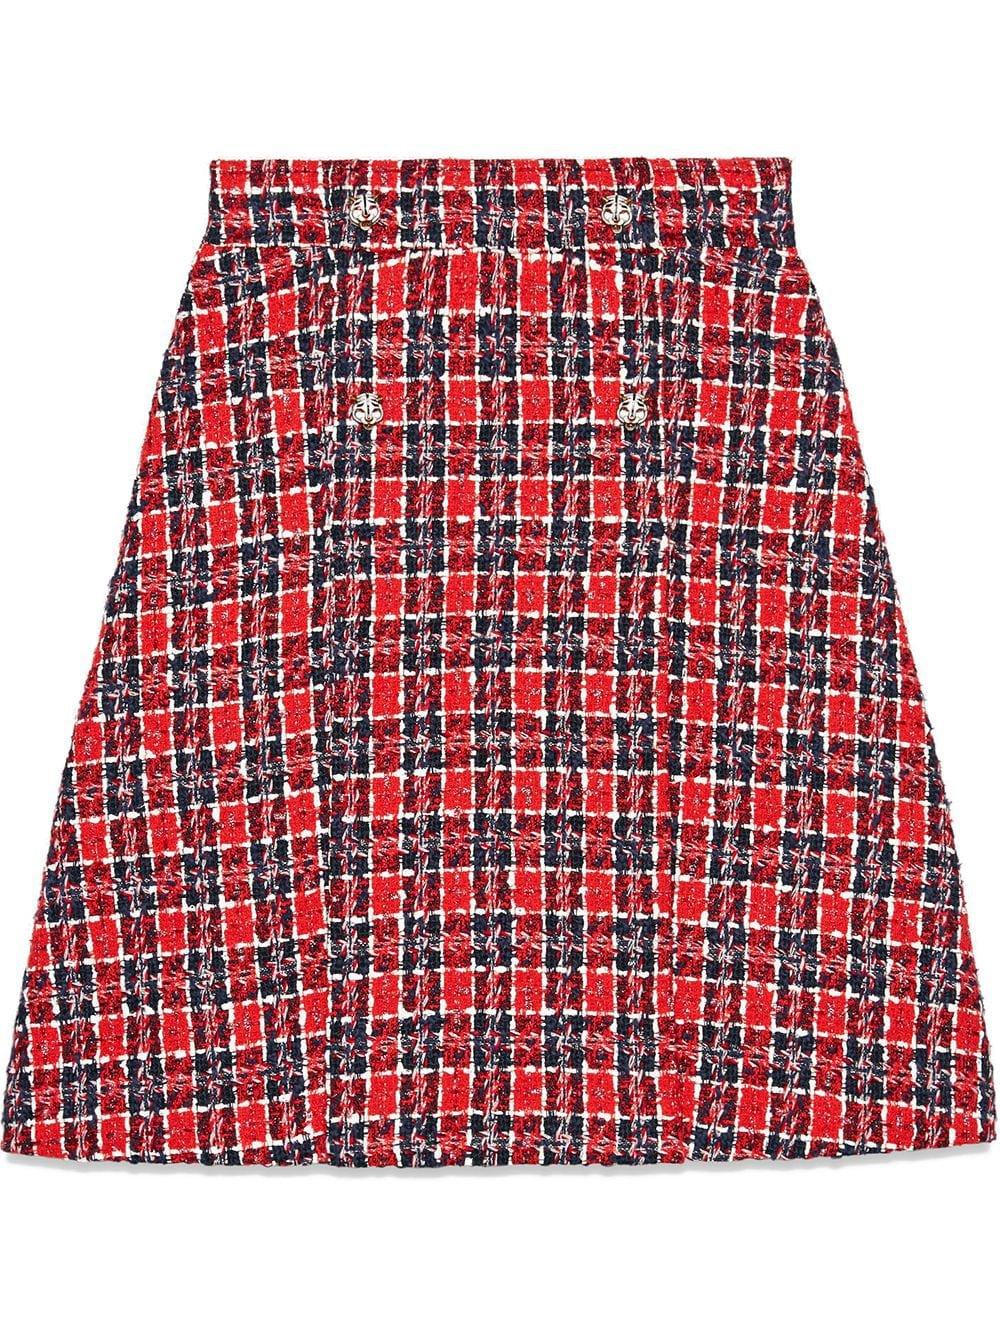 Gucci Tweed Check A-line Skirt | Farfetch.com